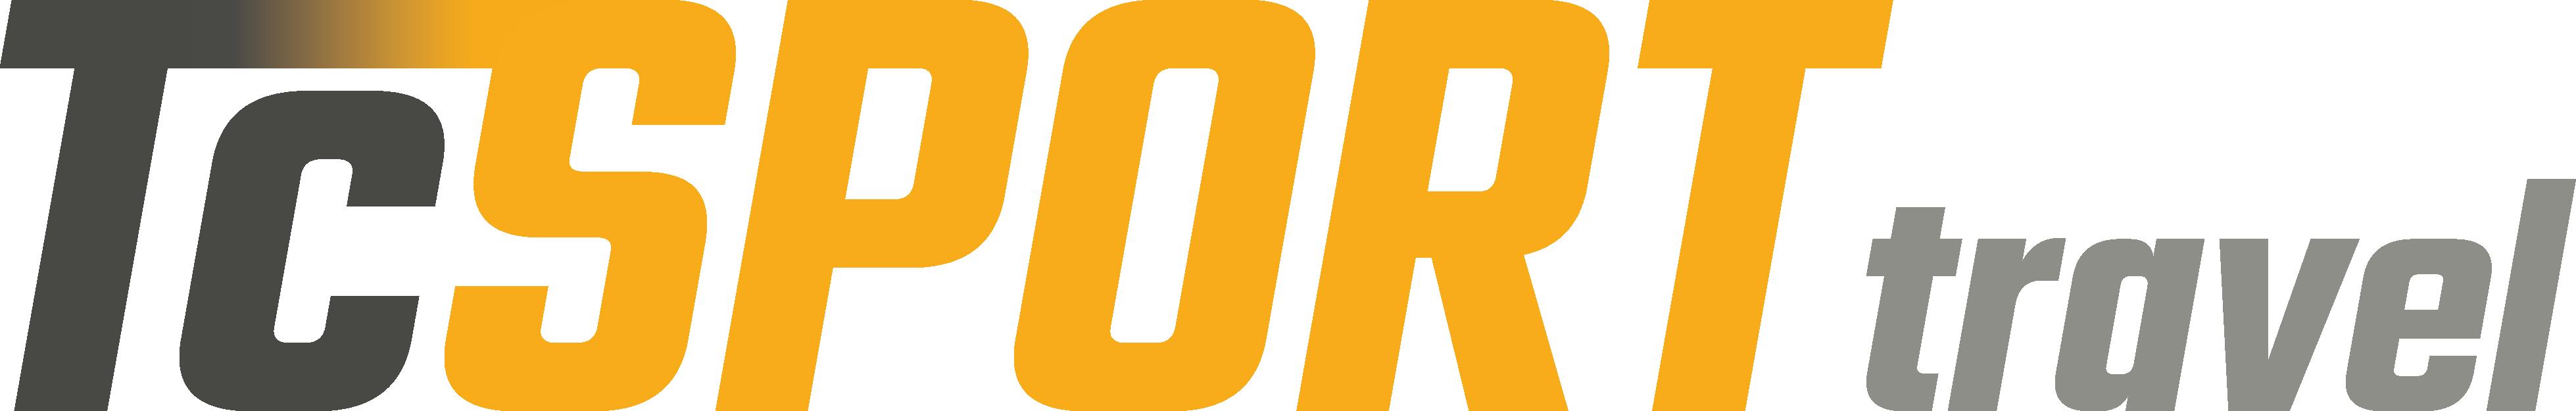 TCsport logo